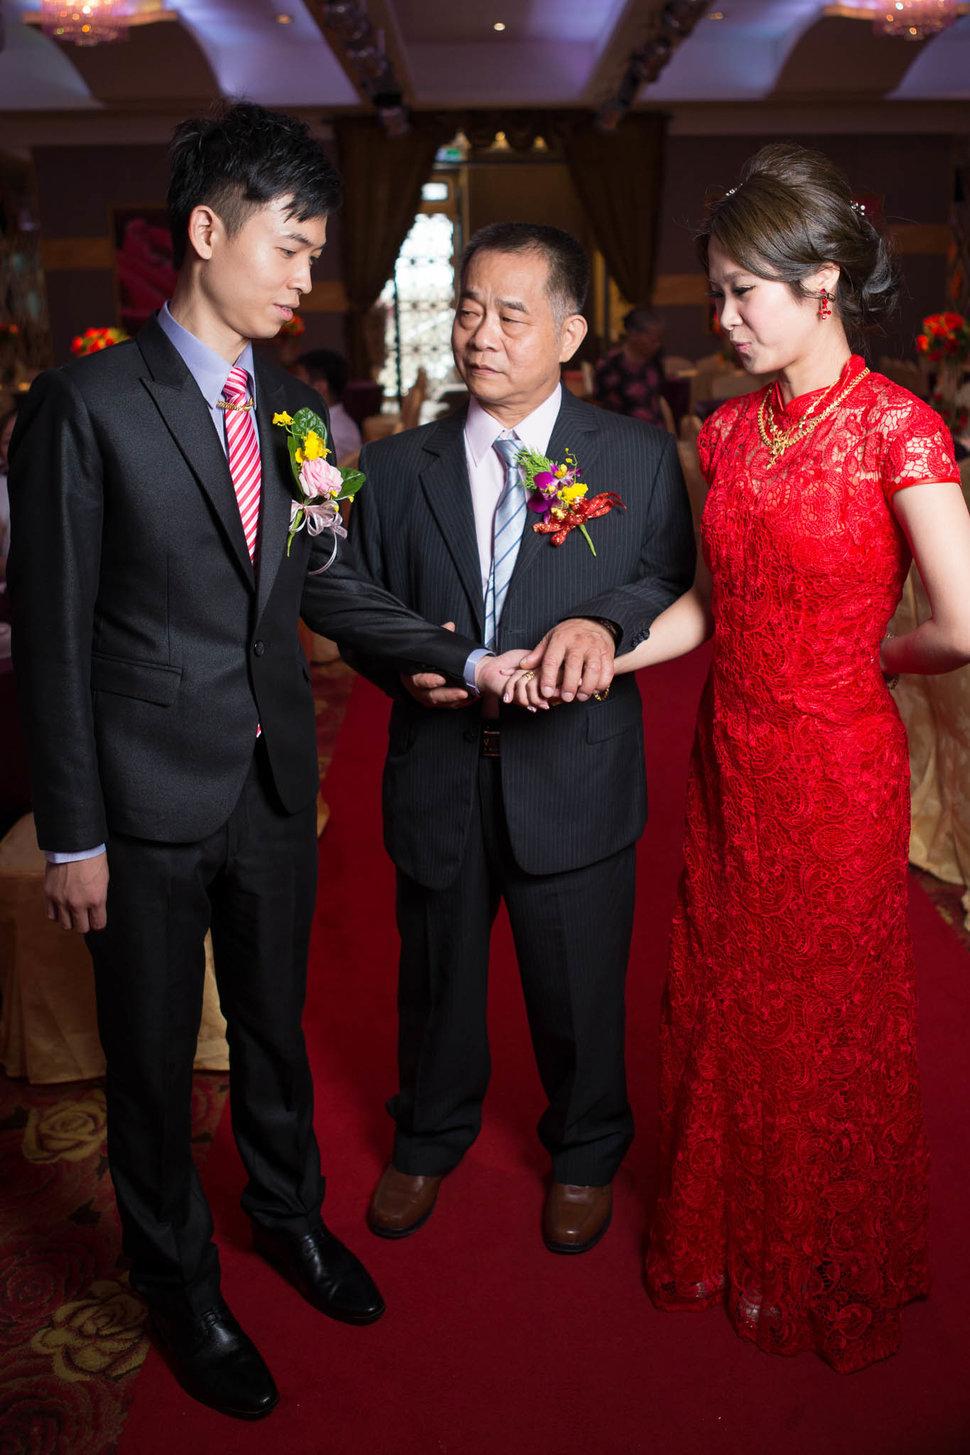 18PHOTO-TIM❤️ ROSA(編號:220642) - 18PHOTO 婚紗影像攝影工作室 - 結婚吧